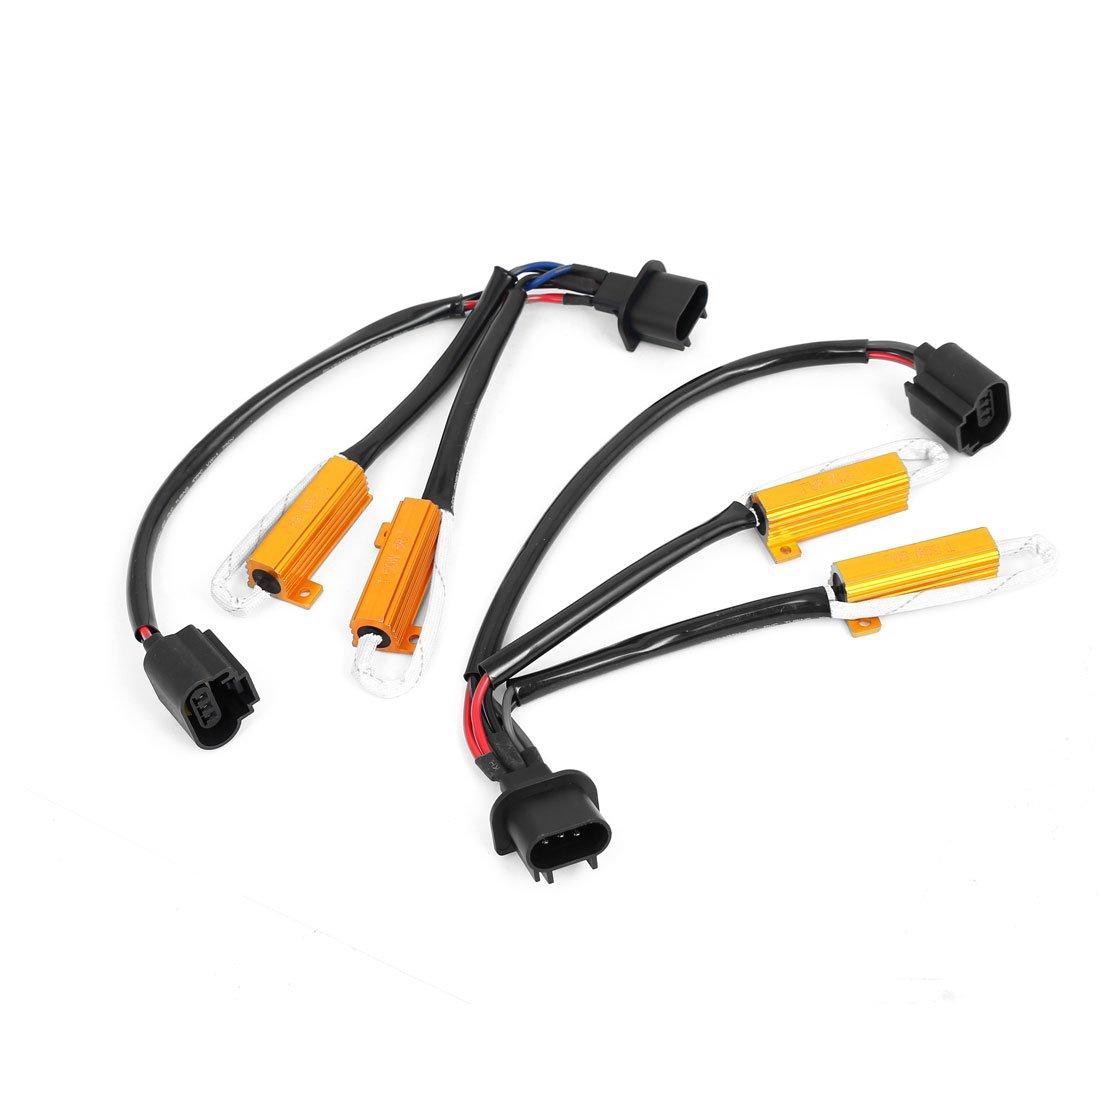 2x H13 9008 Hid Conversion Kit No Error Load Resistor Wiring Harness Resistors Pigtails Sockets Amazon Canada